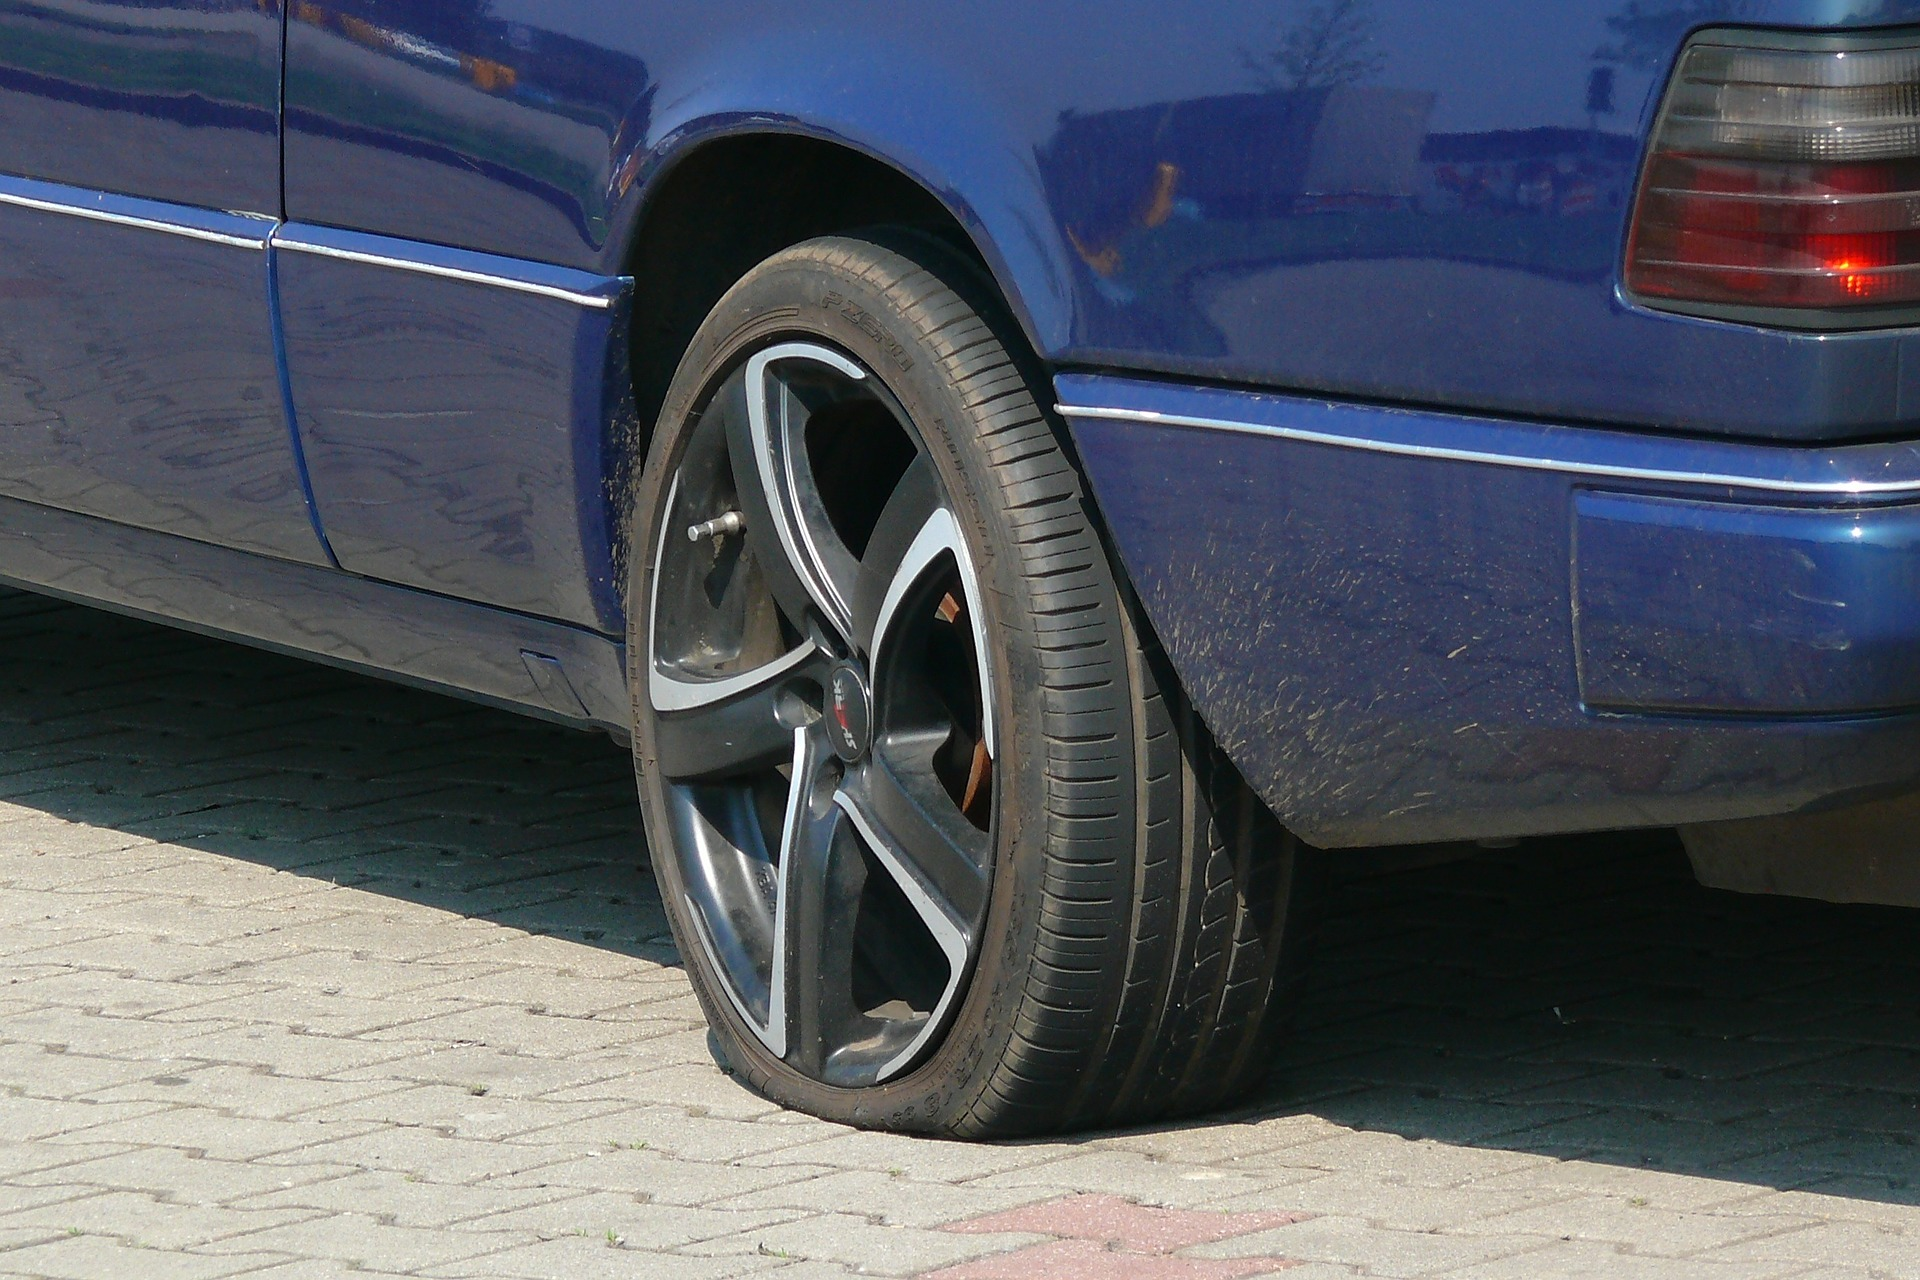 JATMAとETRTO規格のタイヤ空気圧設定は違う?正しく理解しよう!